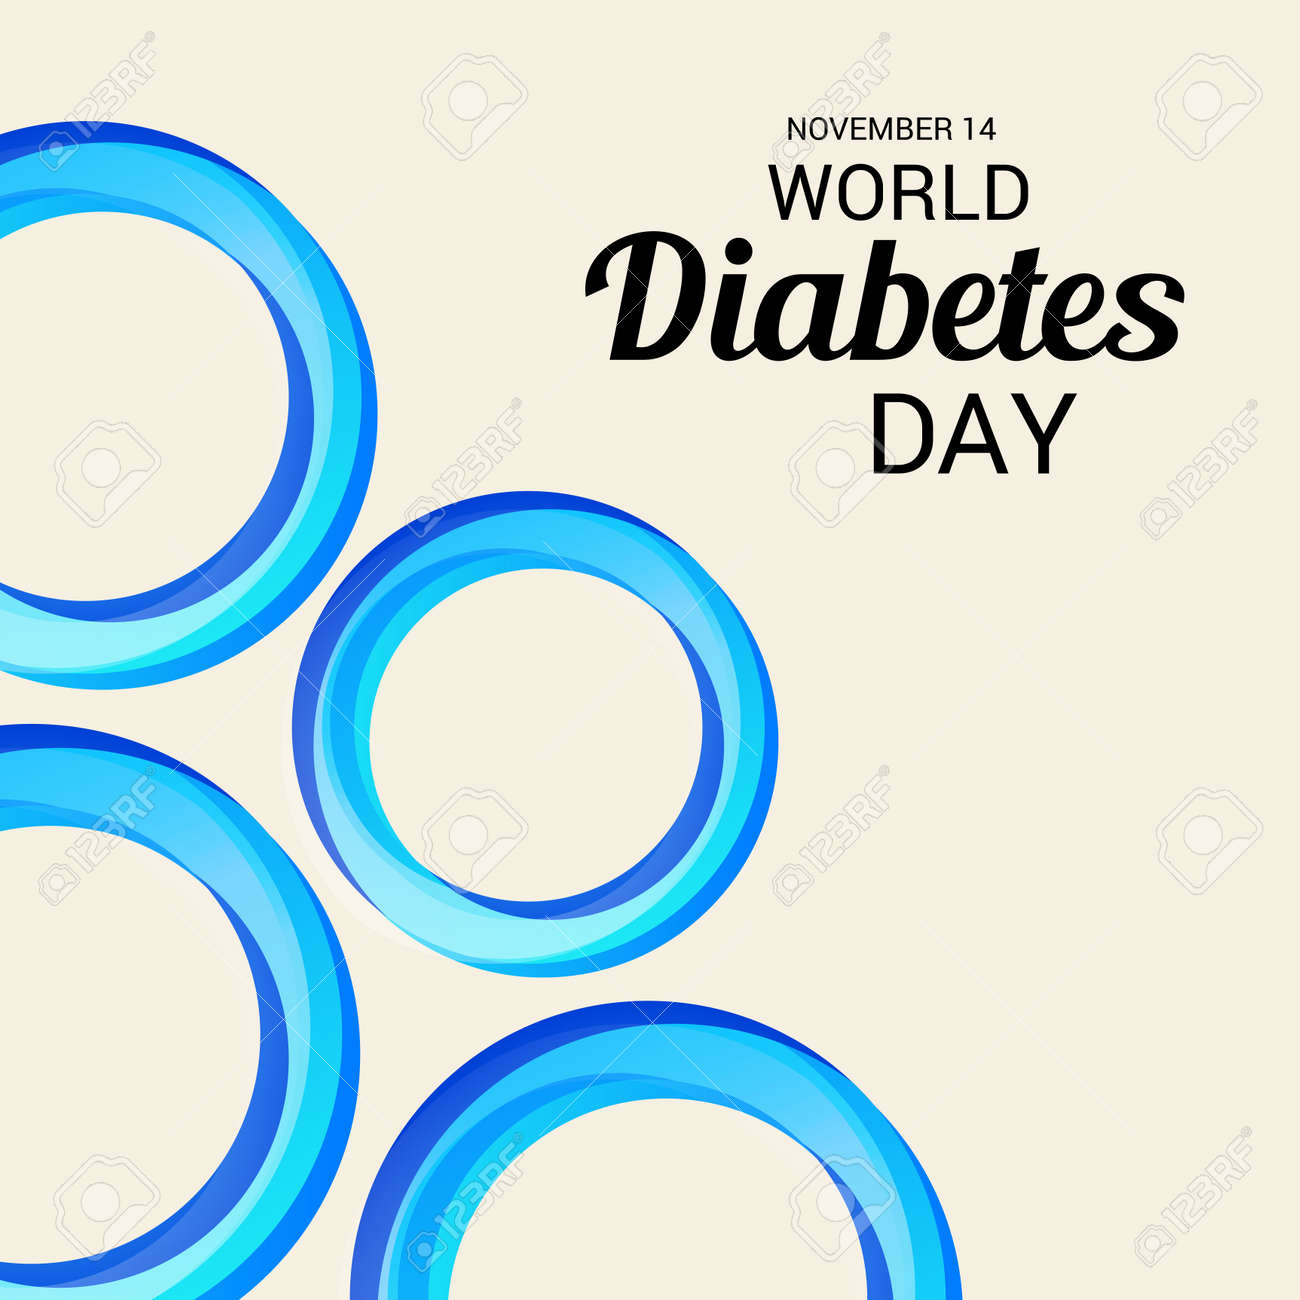 weltdiabetestag 2020 1040